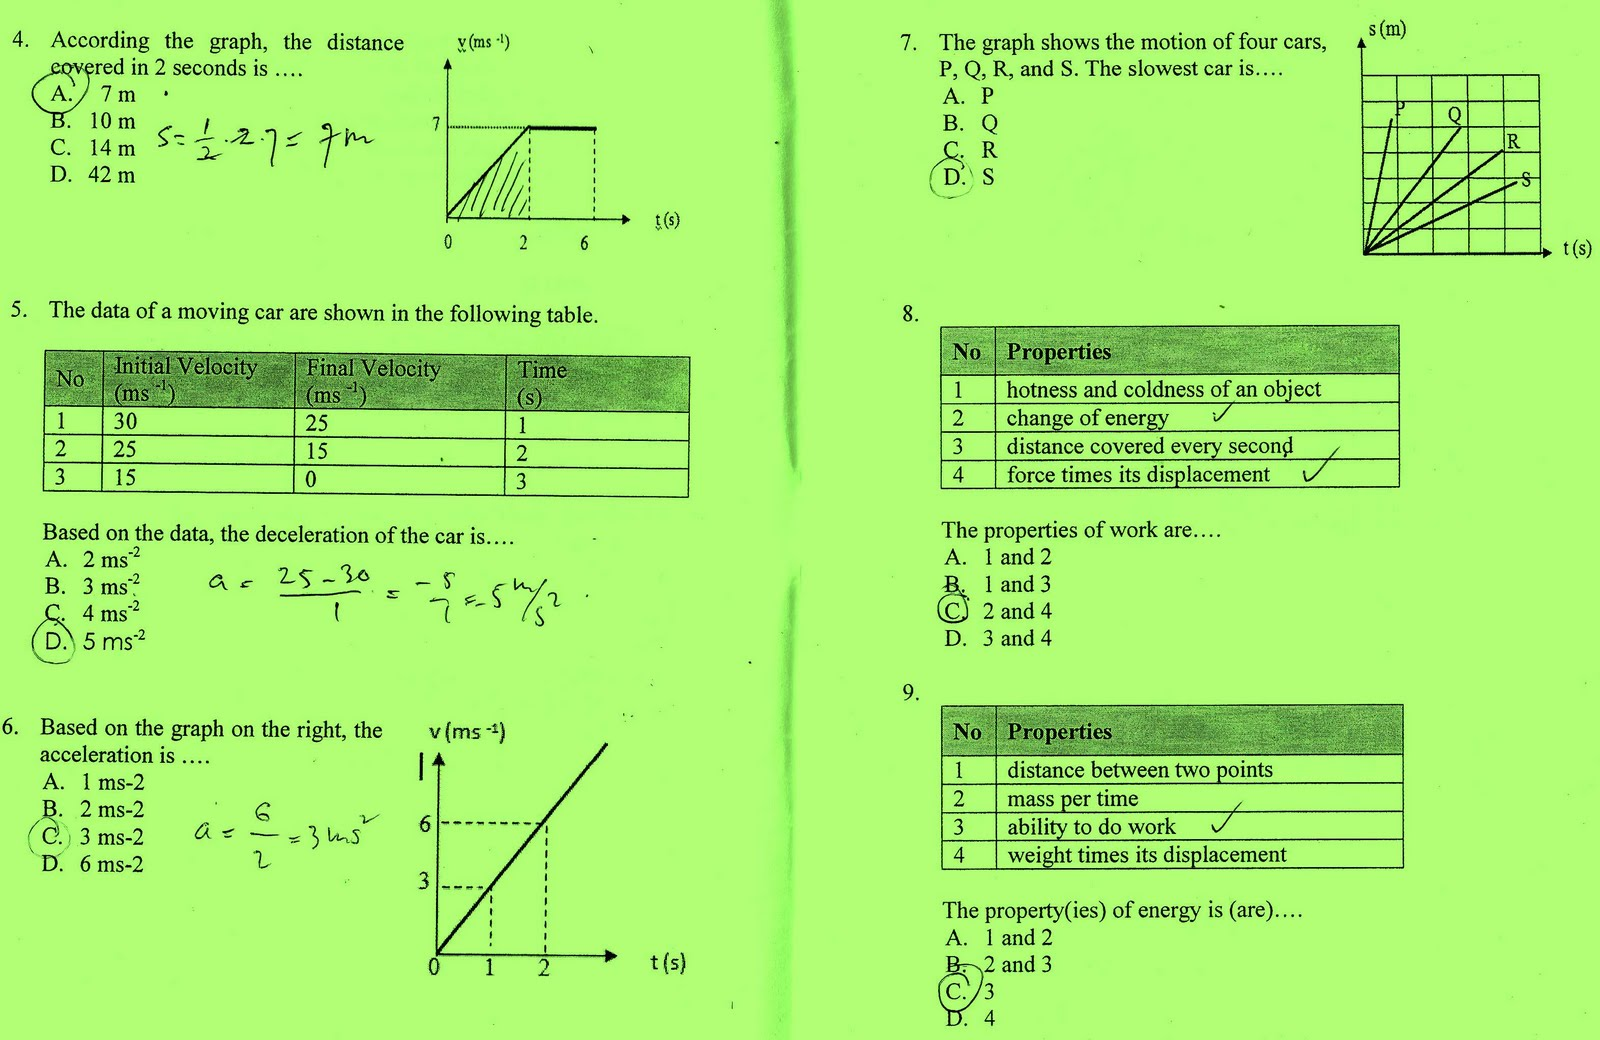 ptk matematika smp kelas 7 2mapa org tebo materi pelajaran matematika